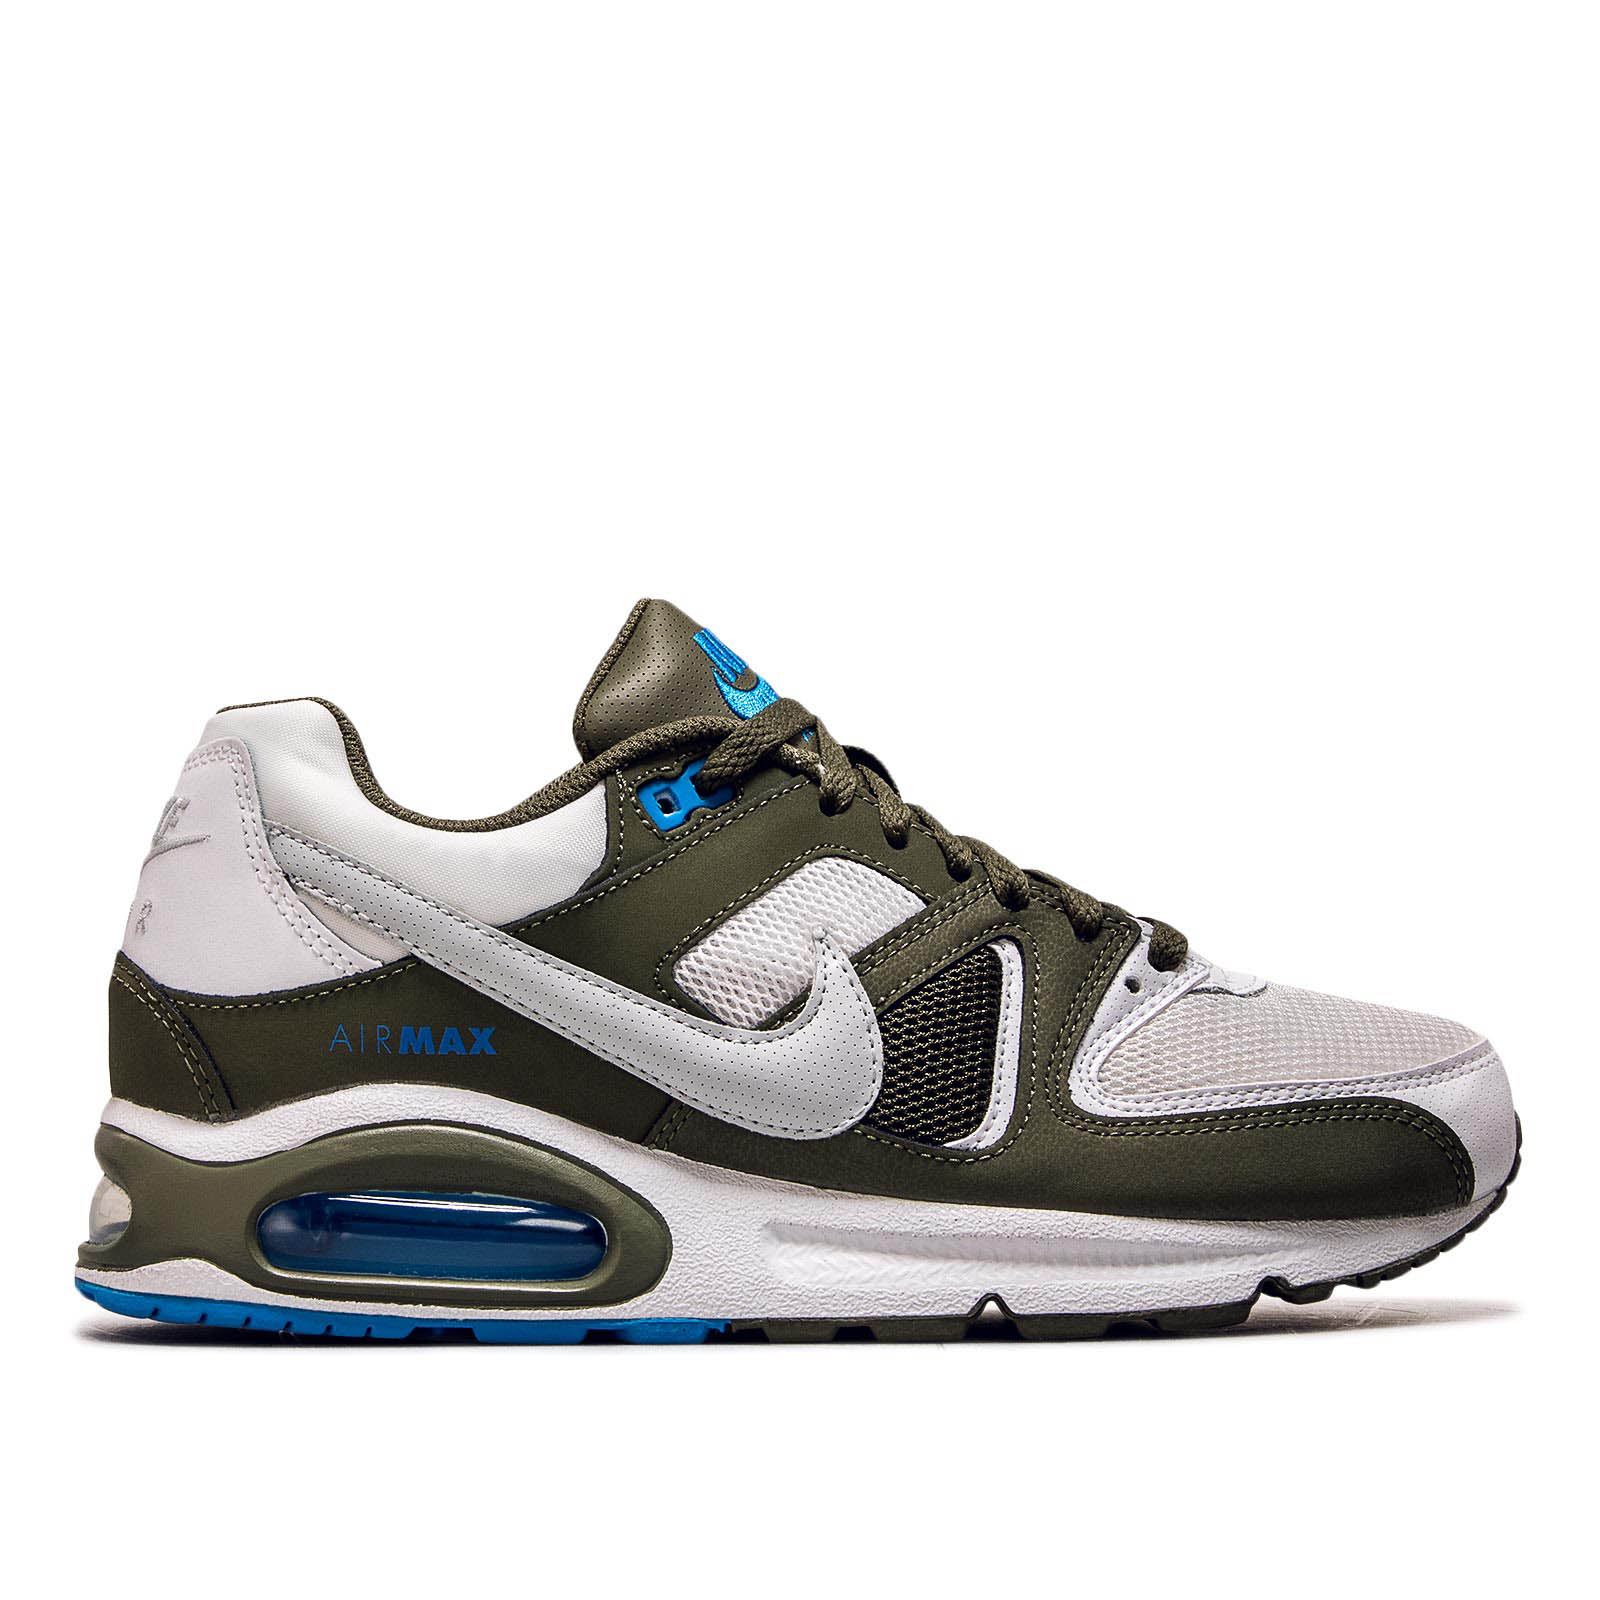 Herren Sneaker Air Max Command White Olive